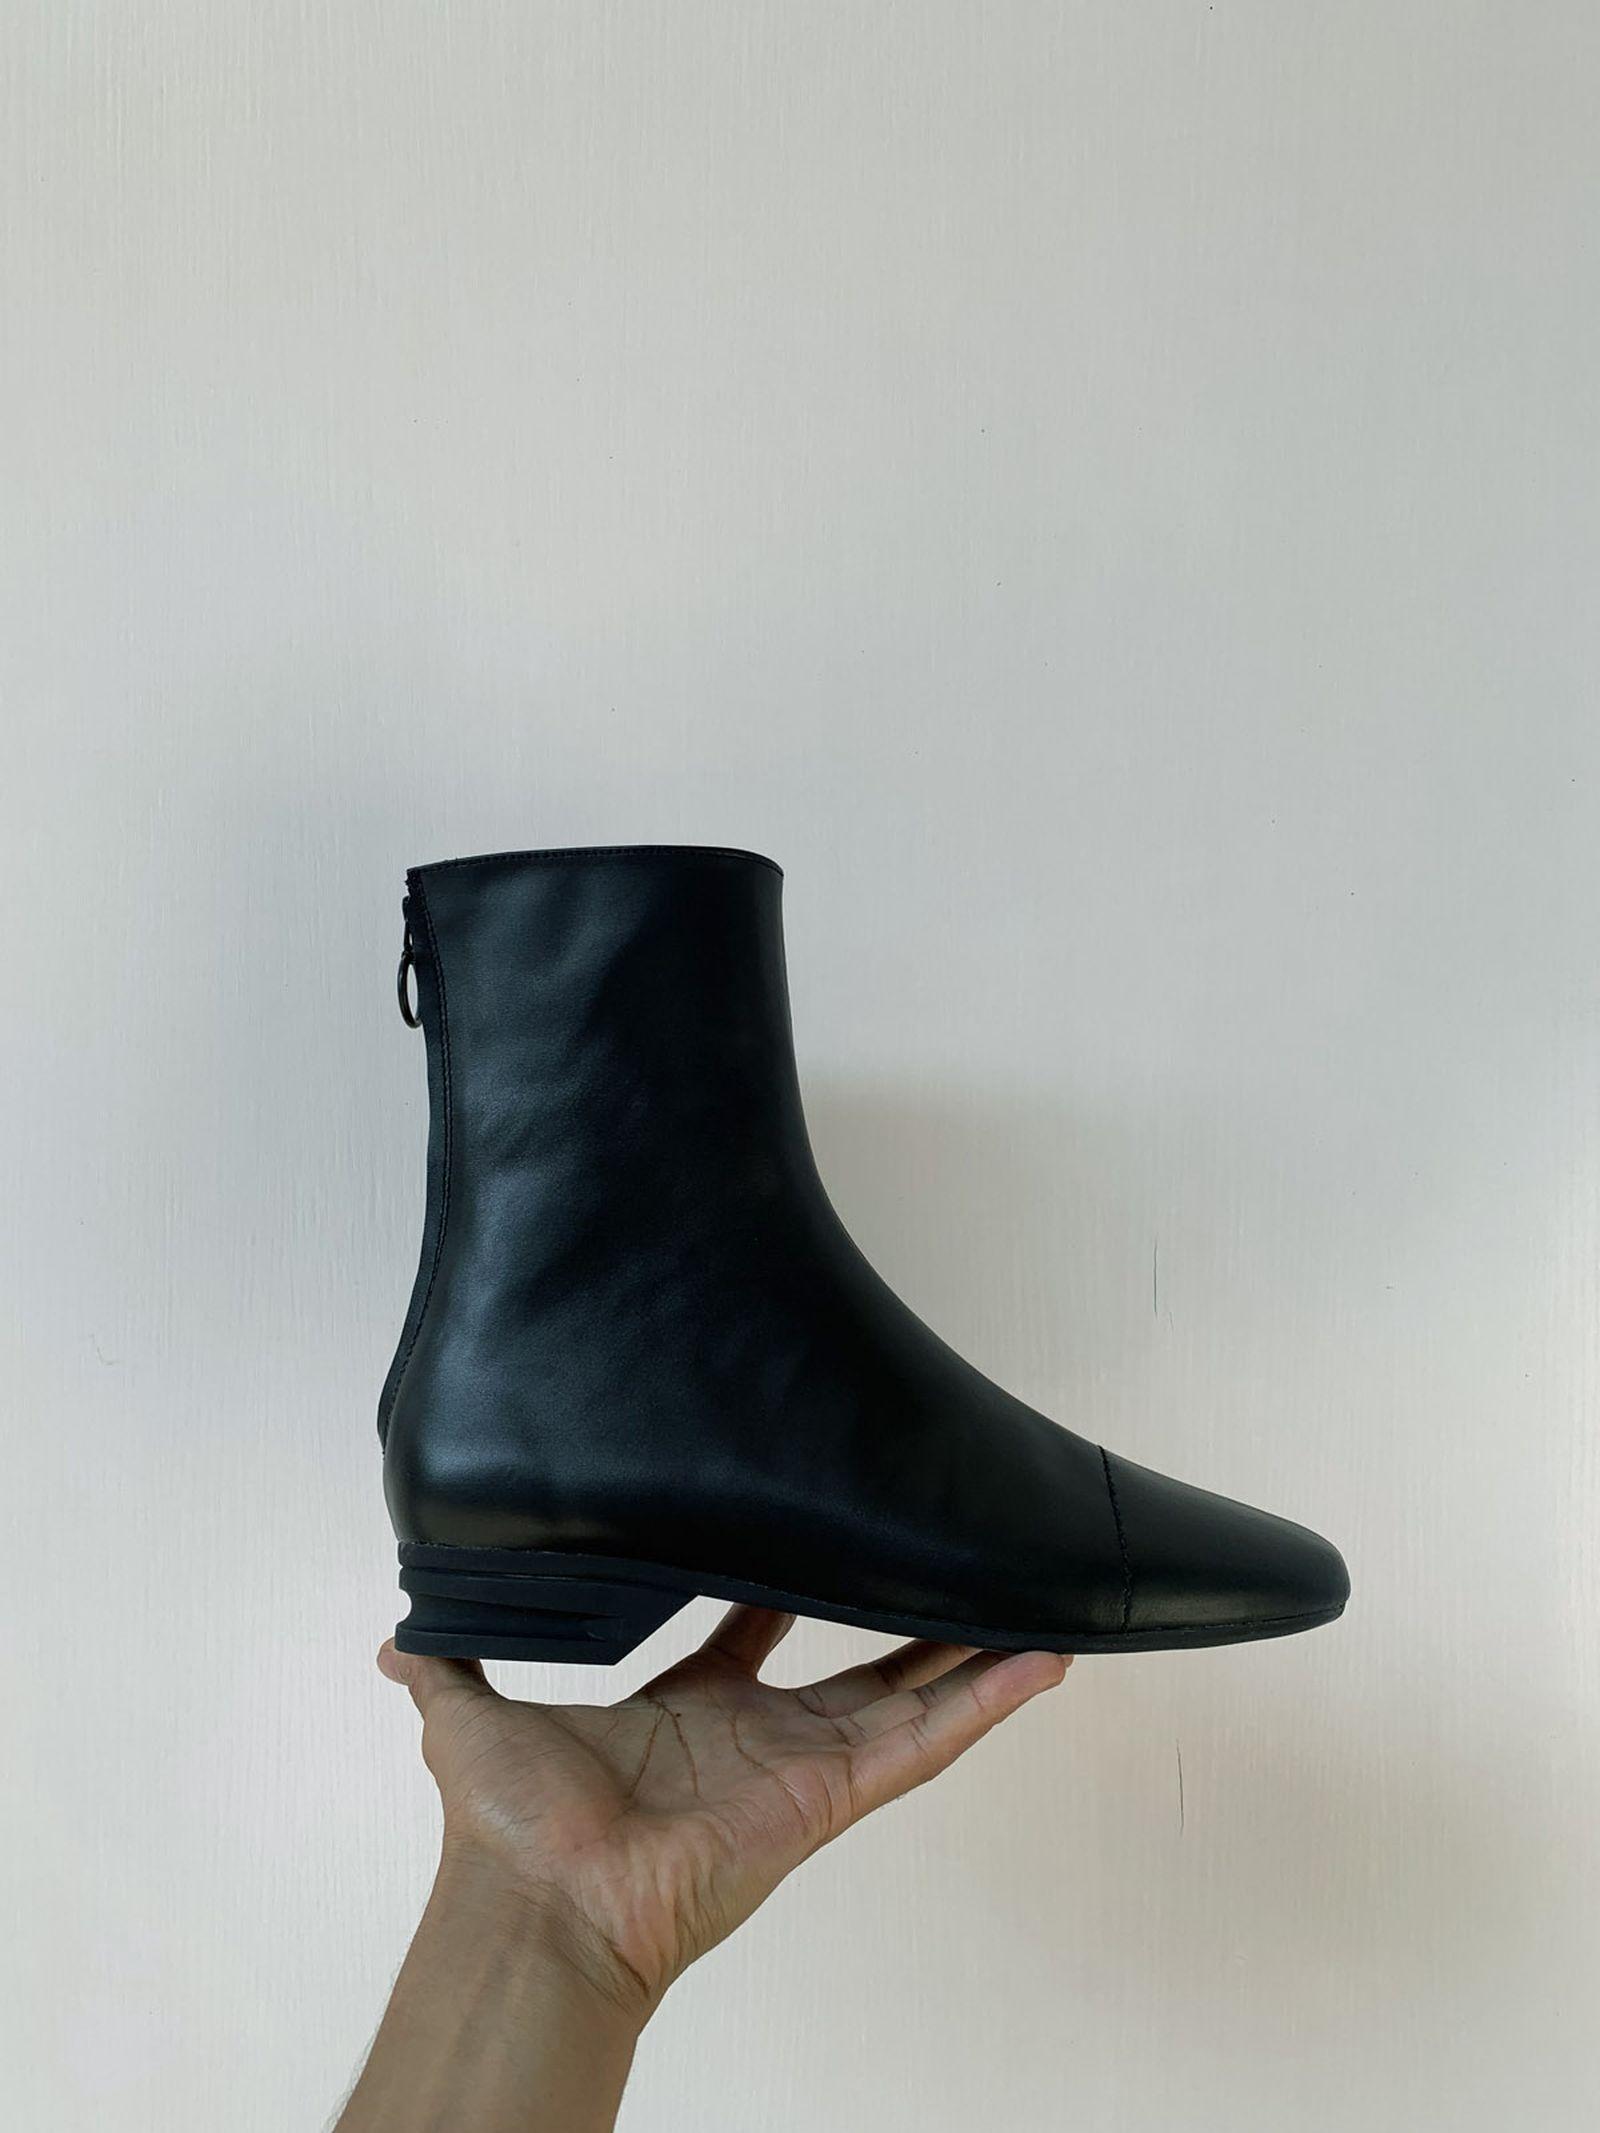 myles-omeally-next-gen-sneakers-10